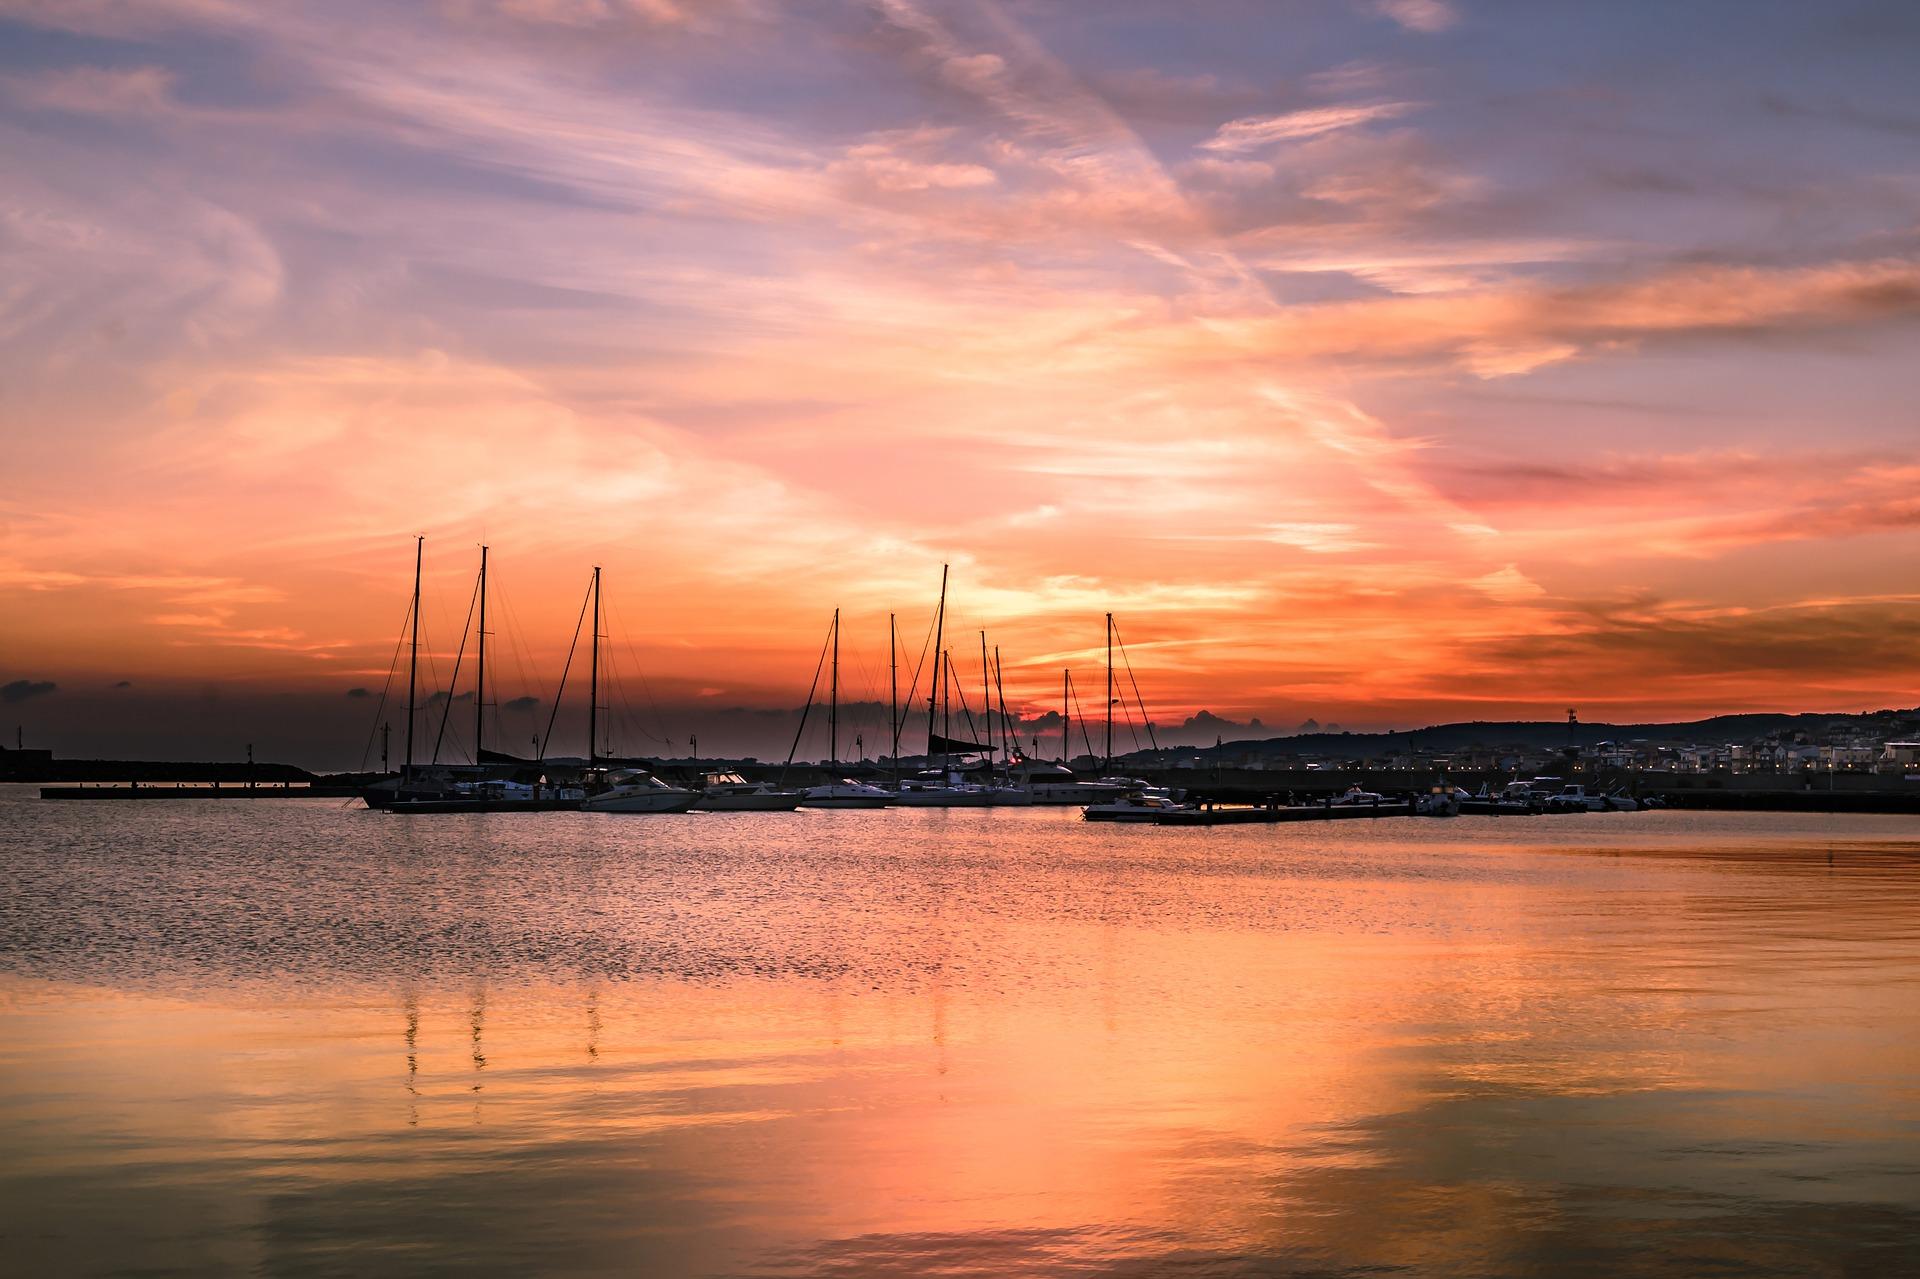 adriatic_sea_rent_a_boat_travelling_croatia